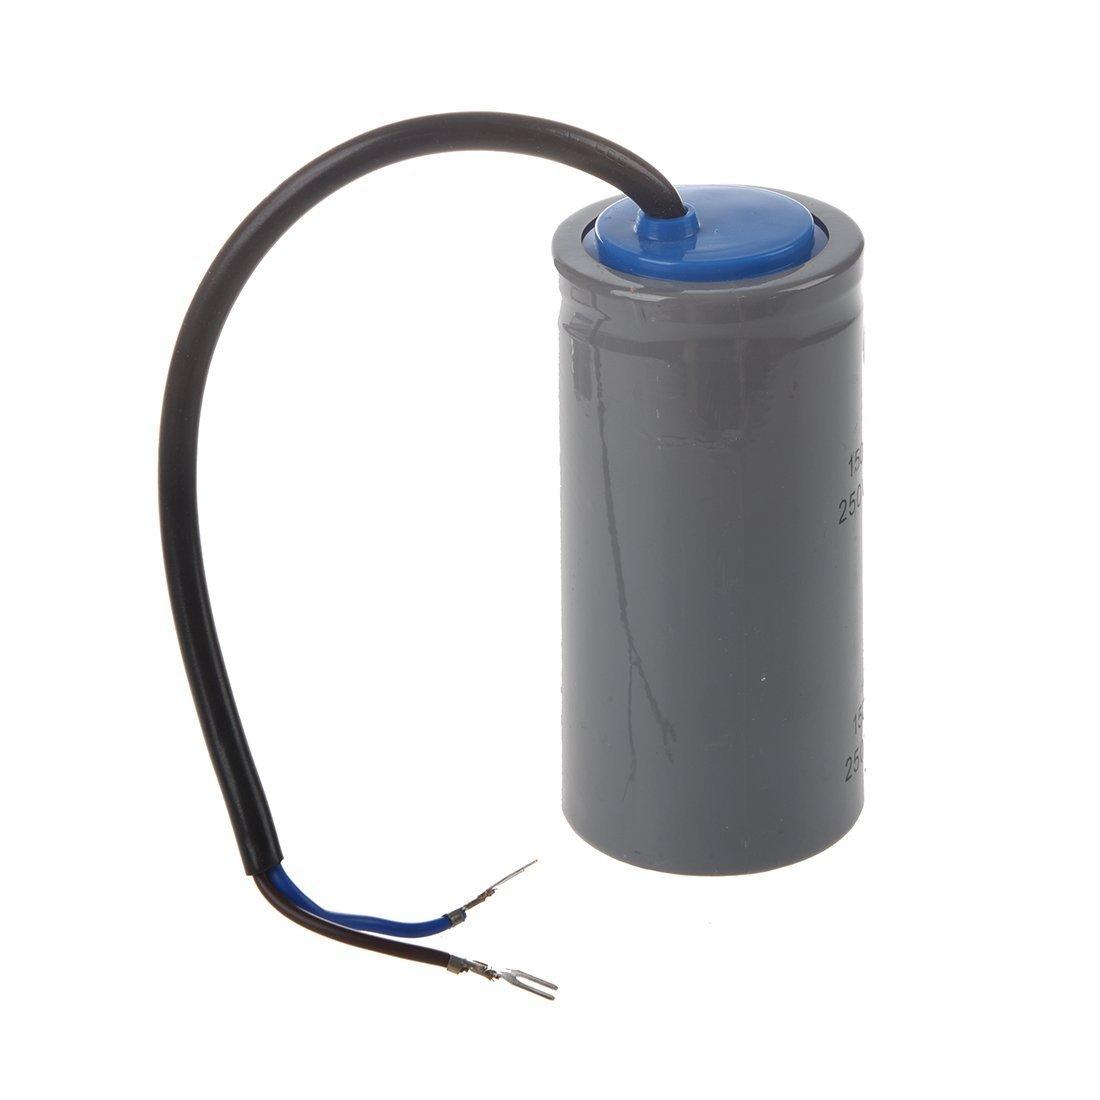 SODIAL(R) CD60 AC 250V 150uF Wired Single Phase Motor Start Capacitor Gray 8638